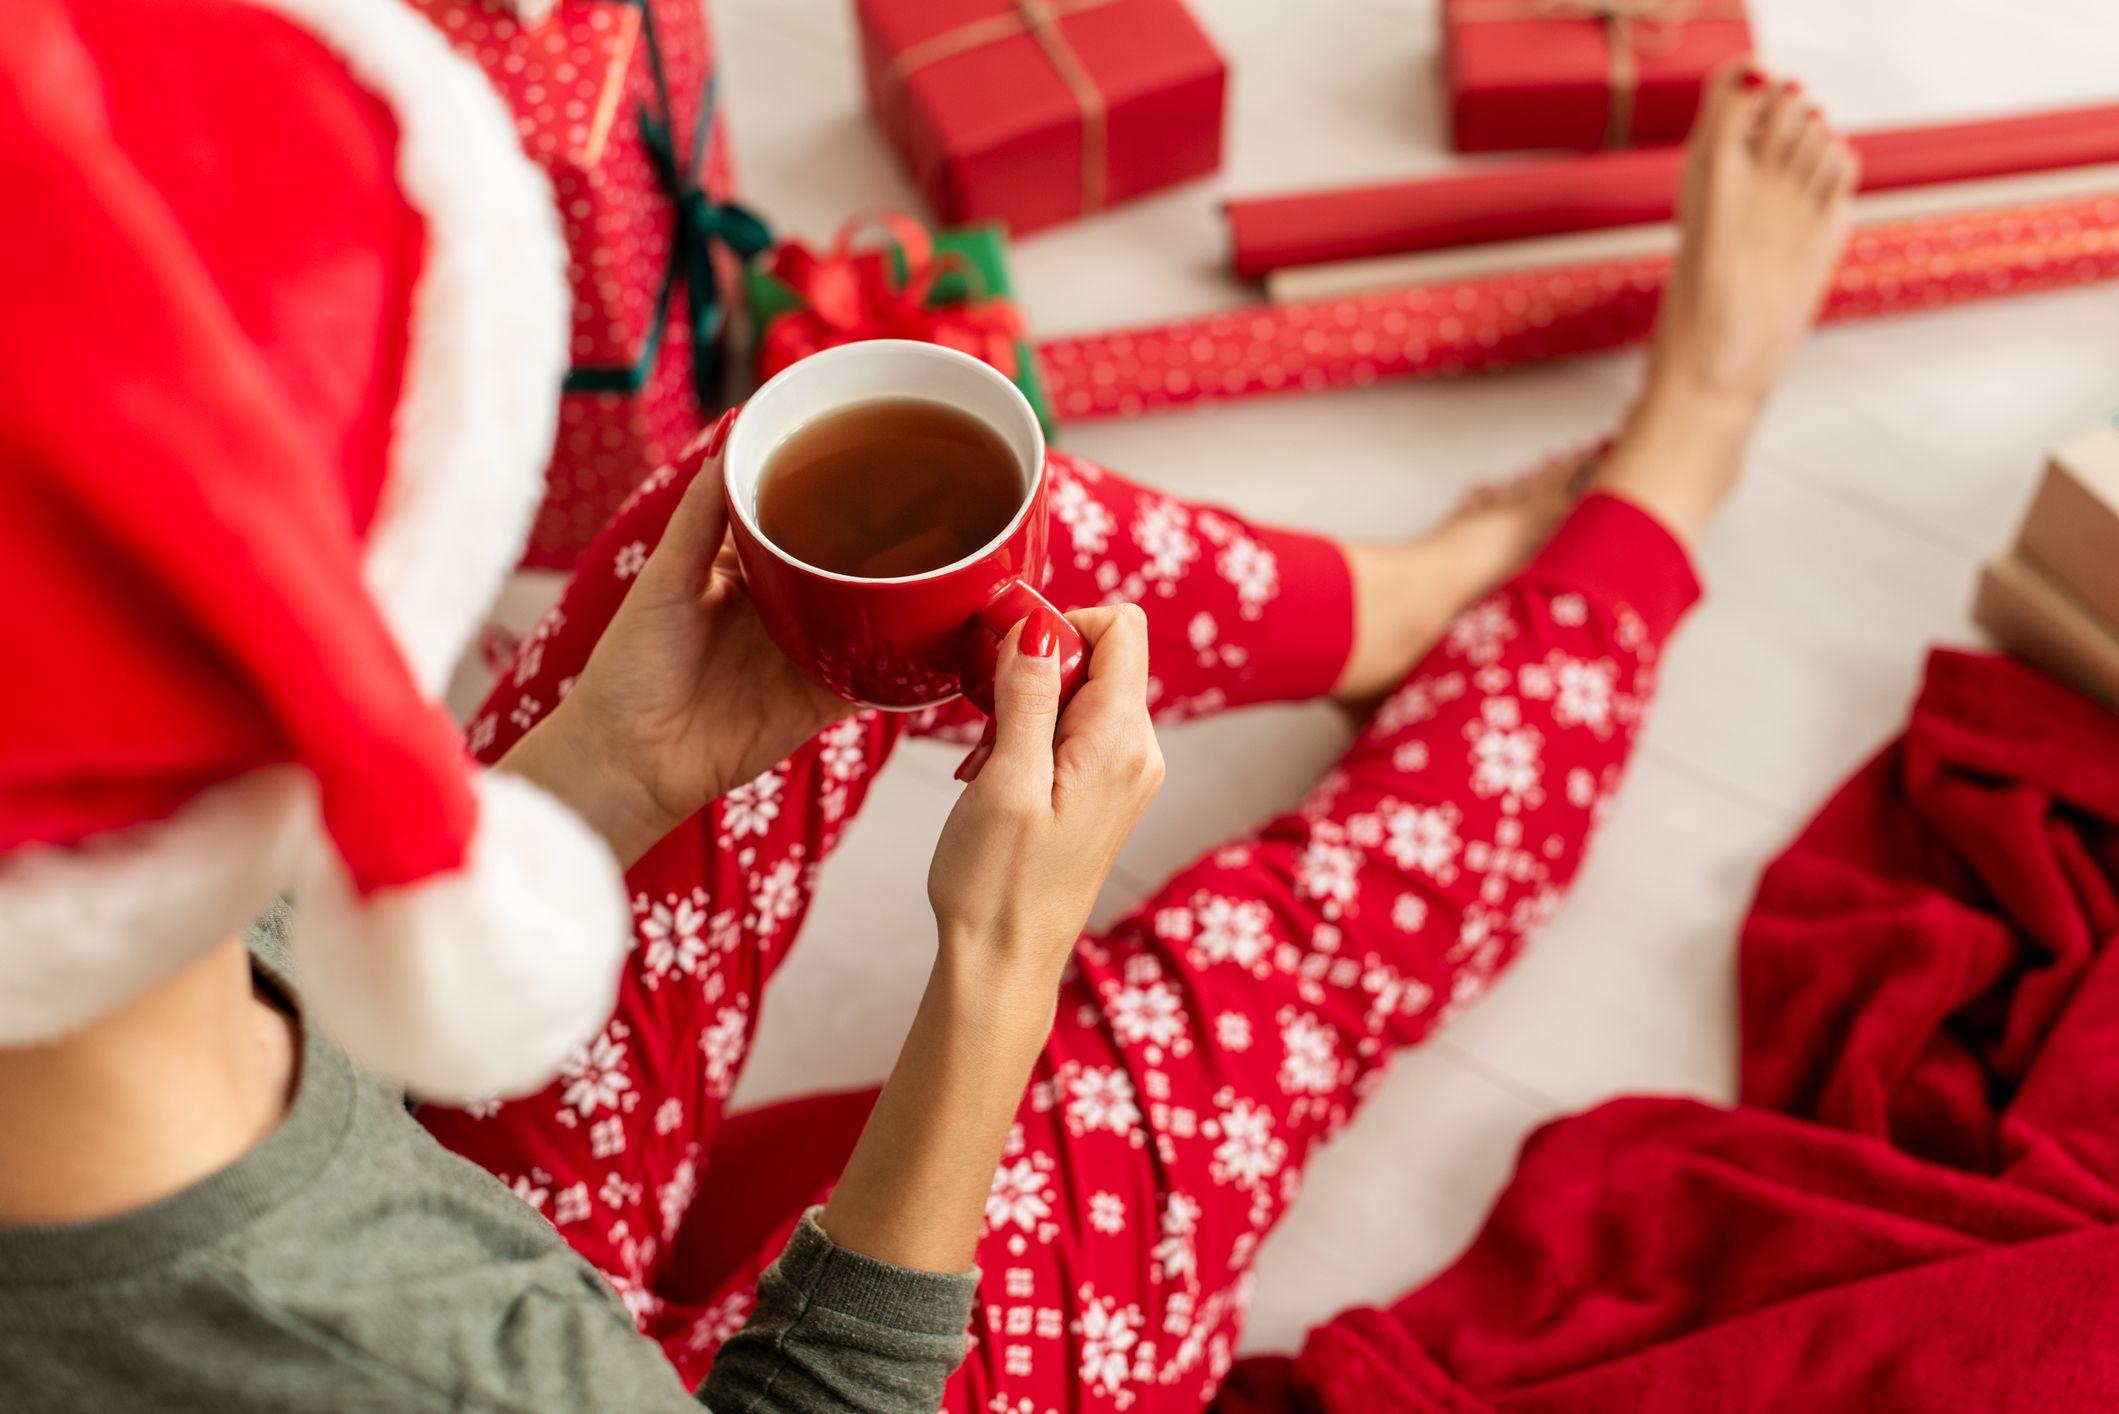 10 Best xmas ideas images | Debenhams uk, Xmas, Christmas